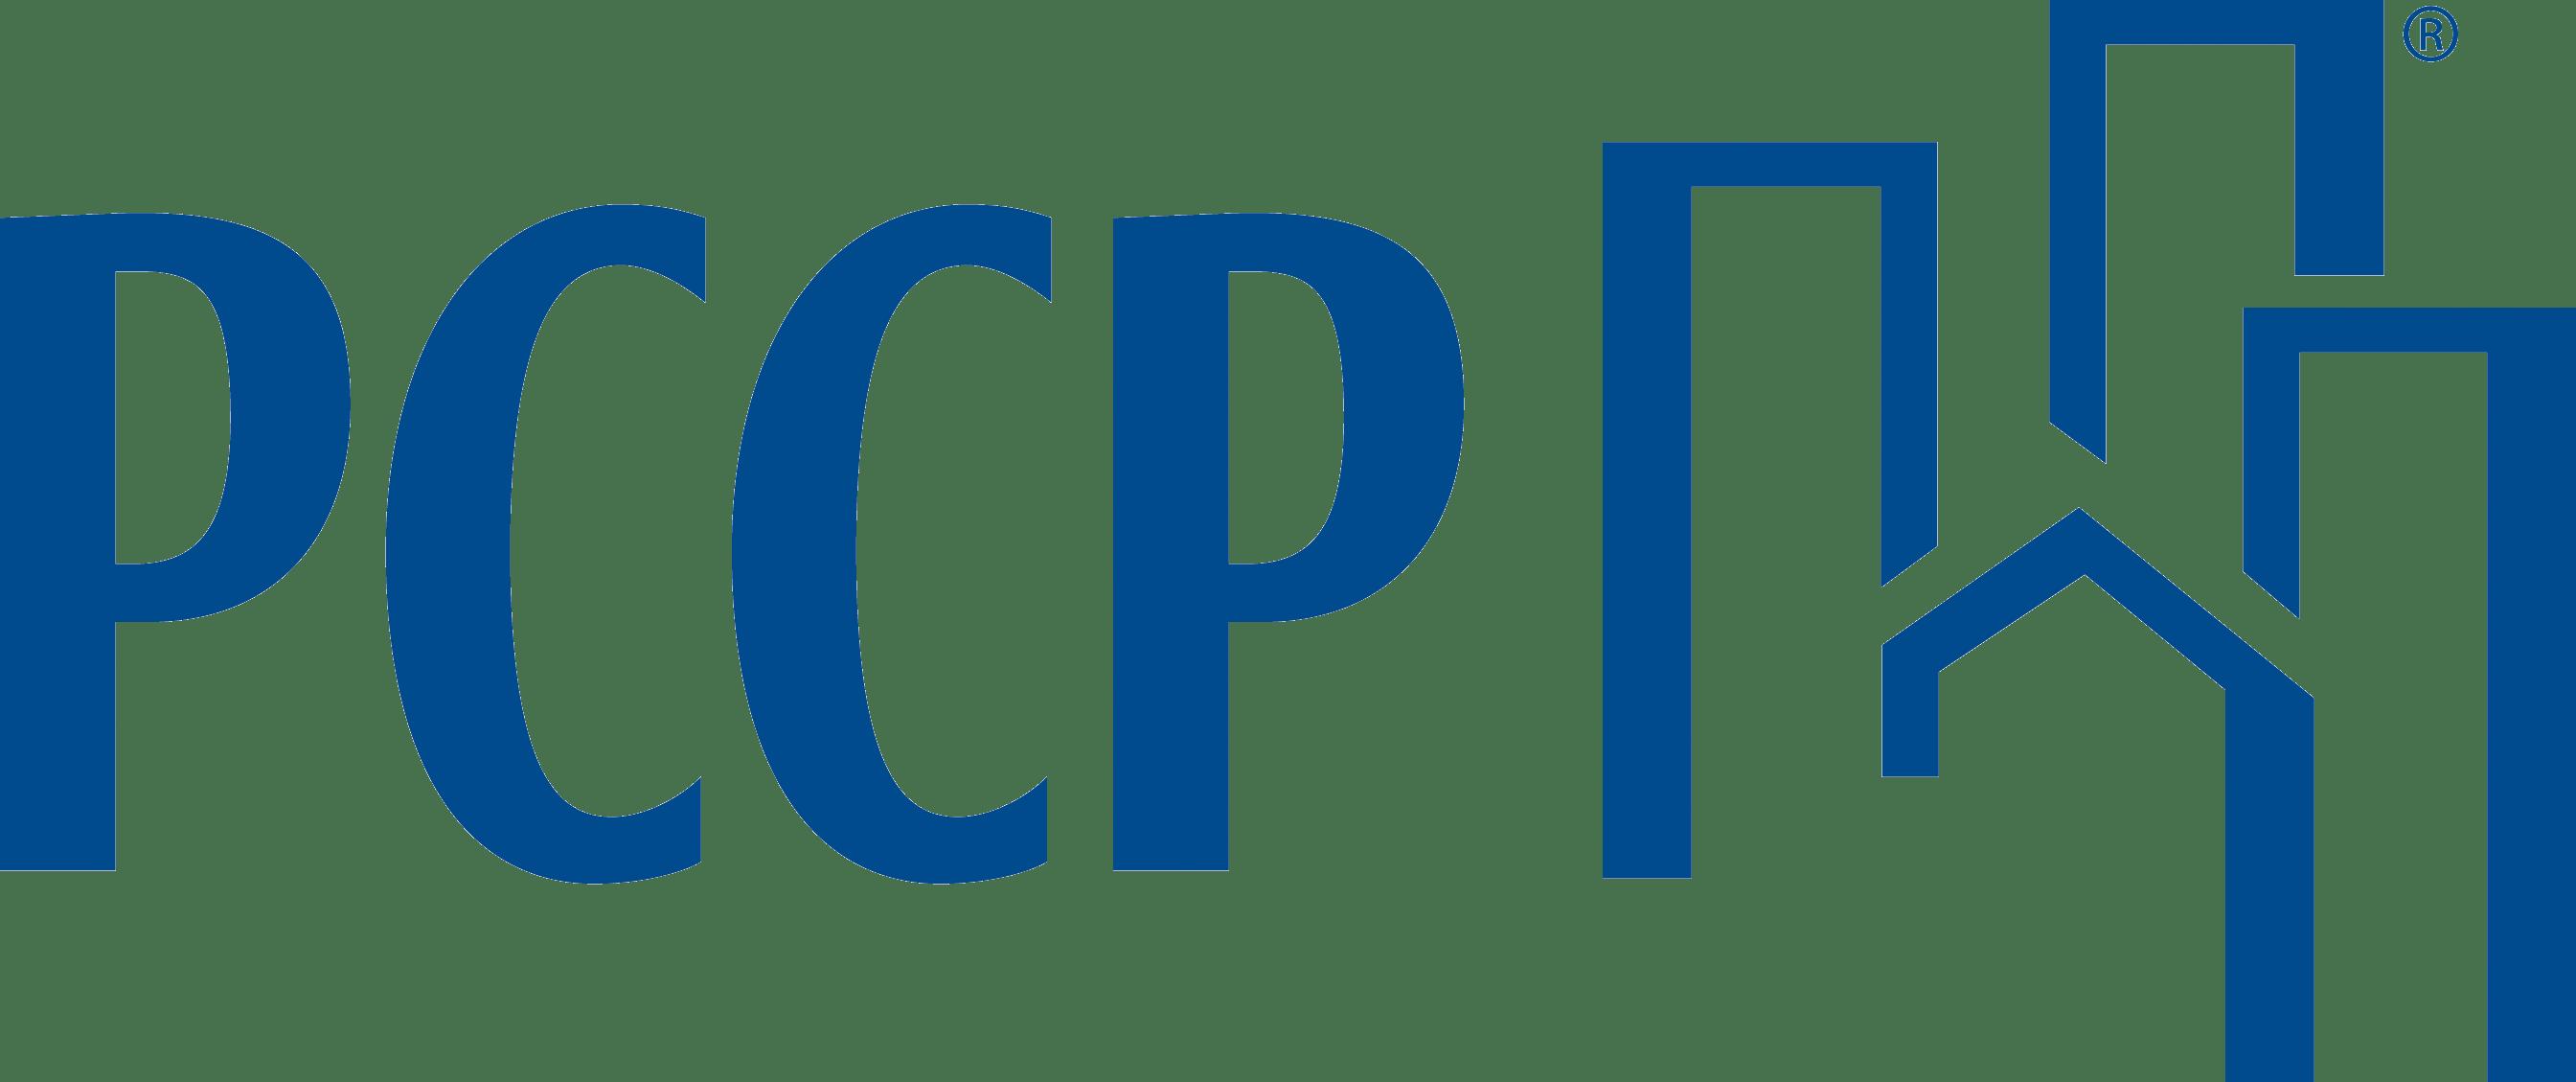 PCCP company logo